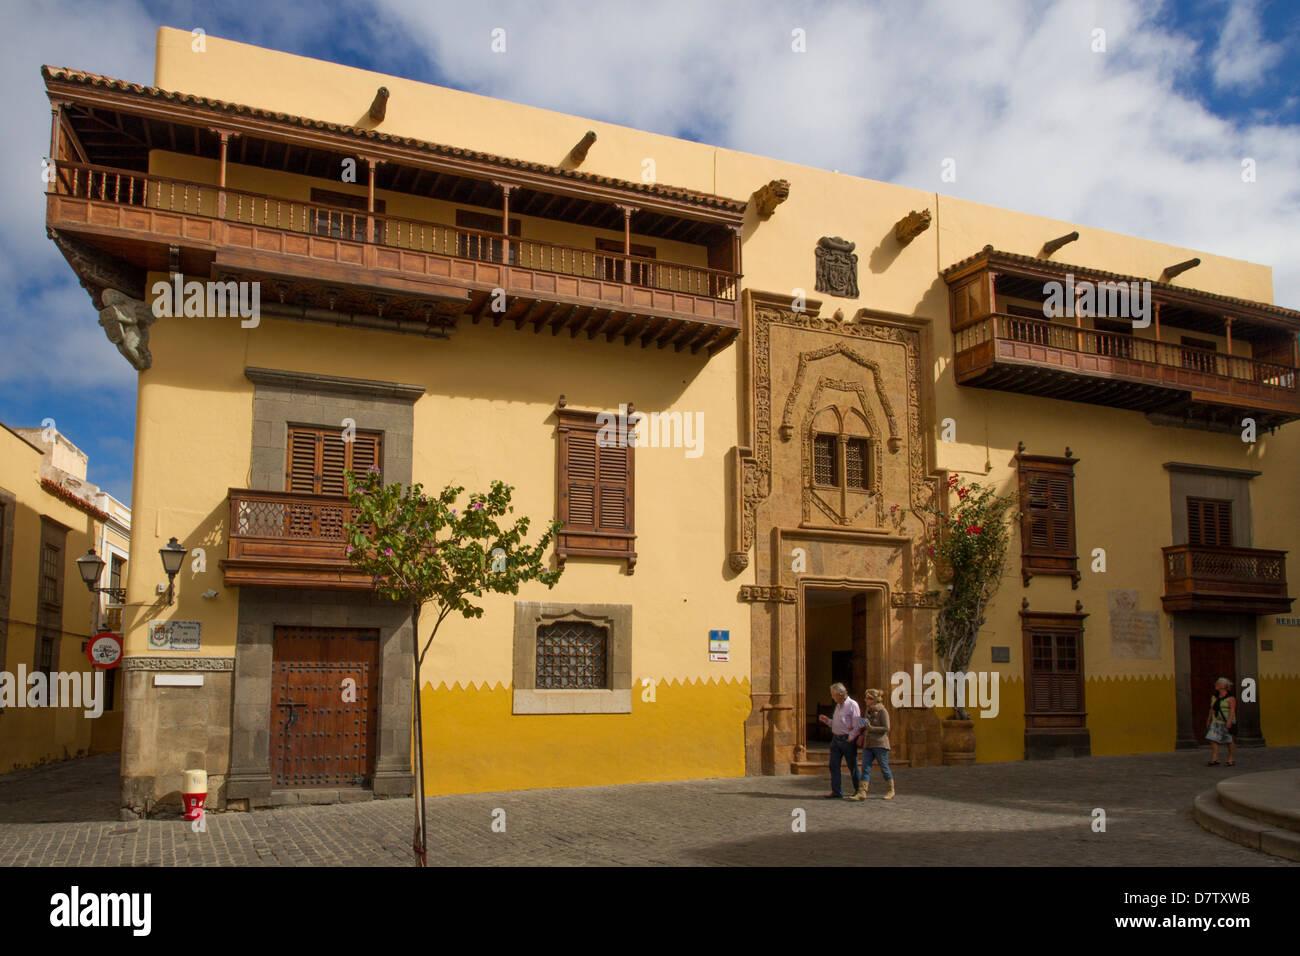 Museum-Residenz des Columbus (Doppelpunkt), Las Palmas, Kanarische Inseln, Spanien Stockbild